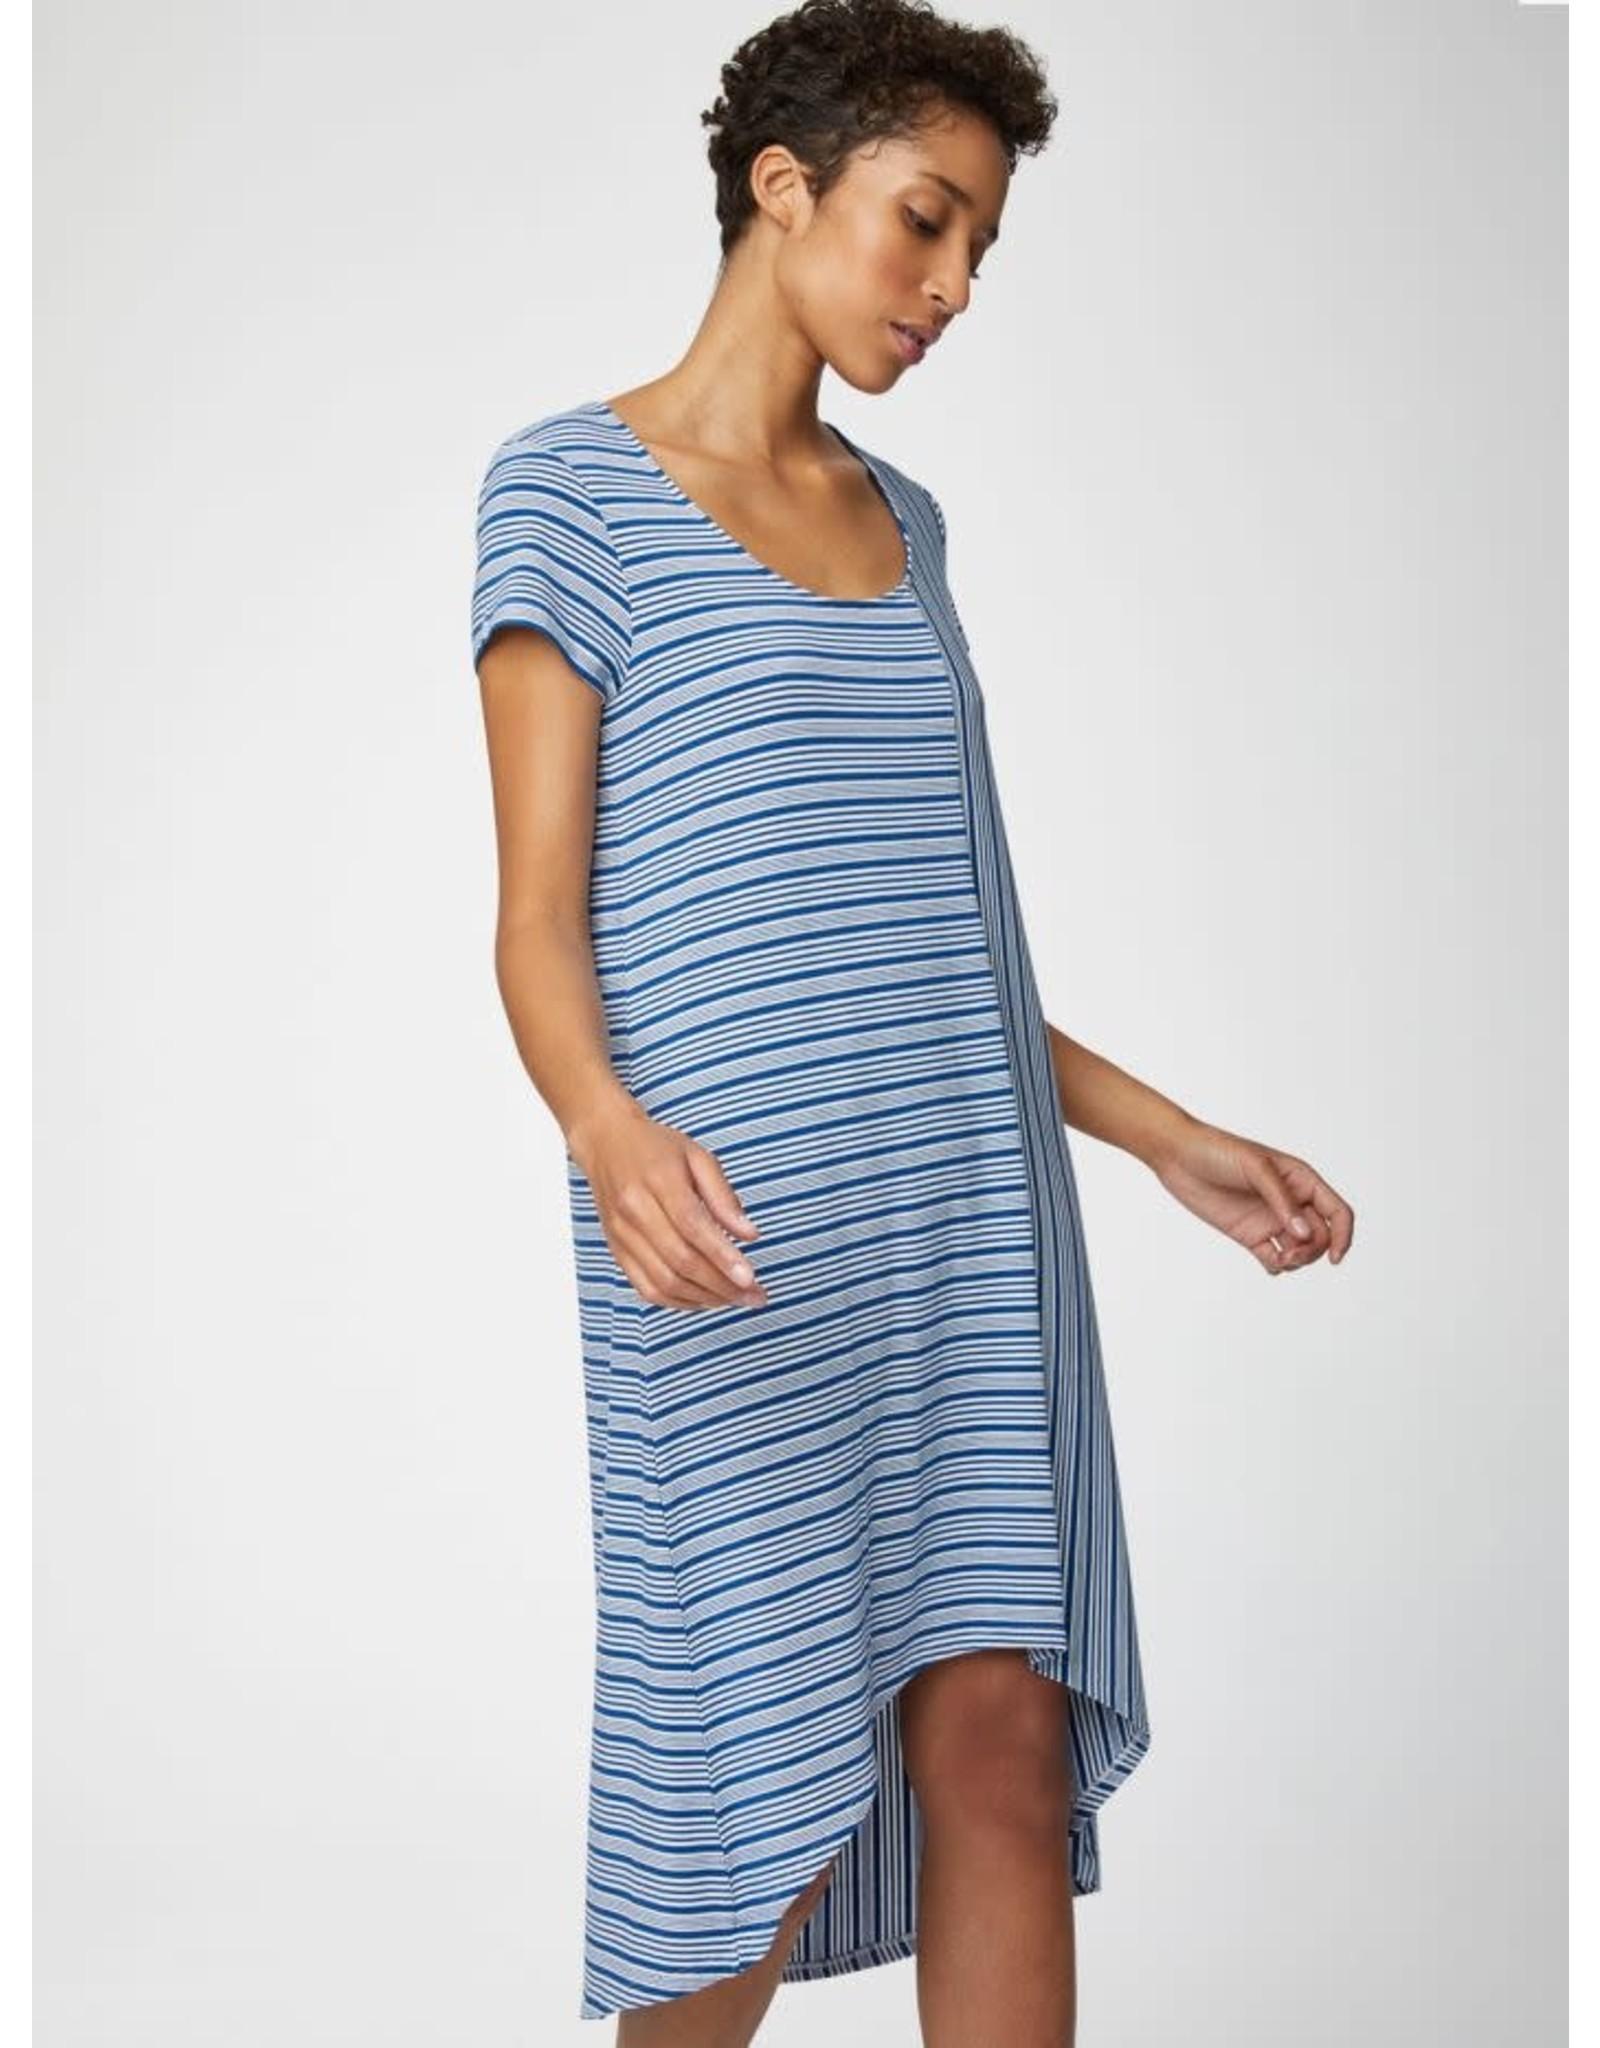 Thought Thought Carlotta Dress